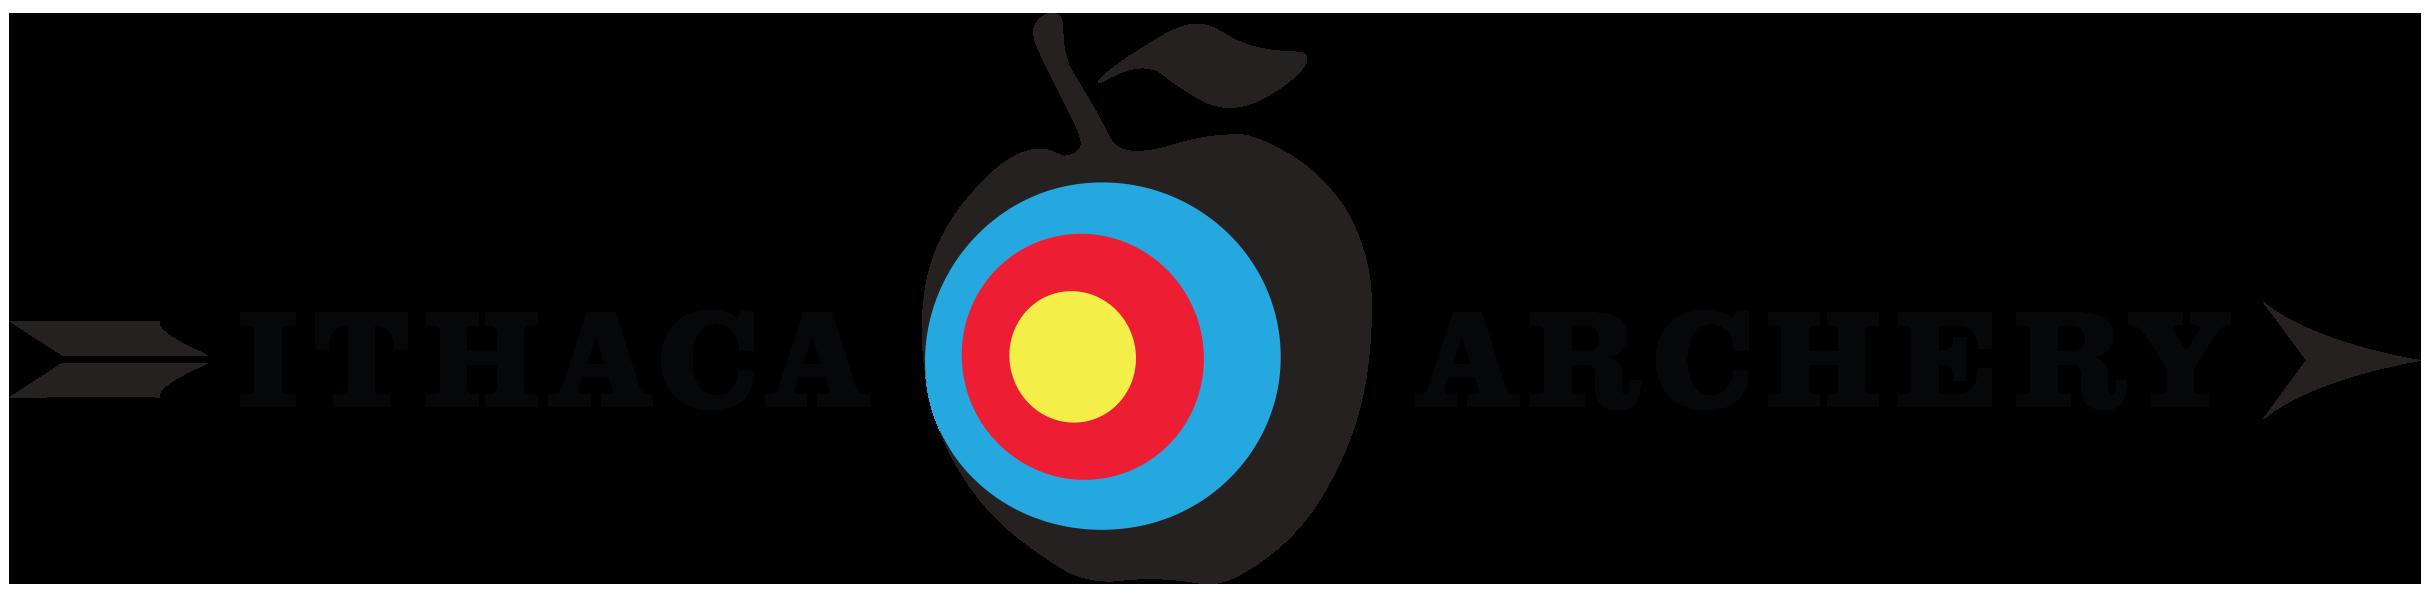 Ithaca Archery